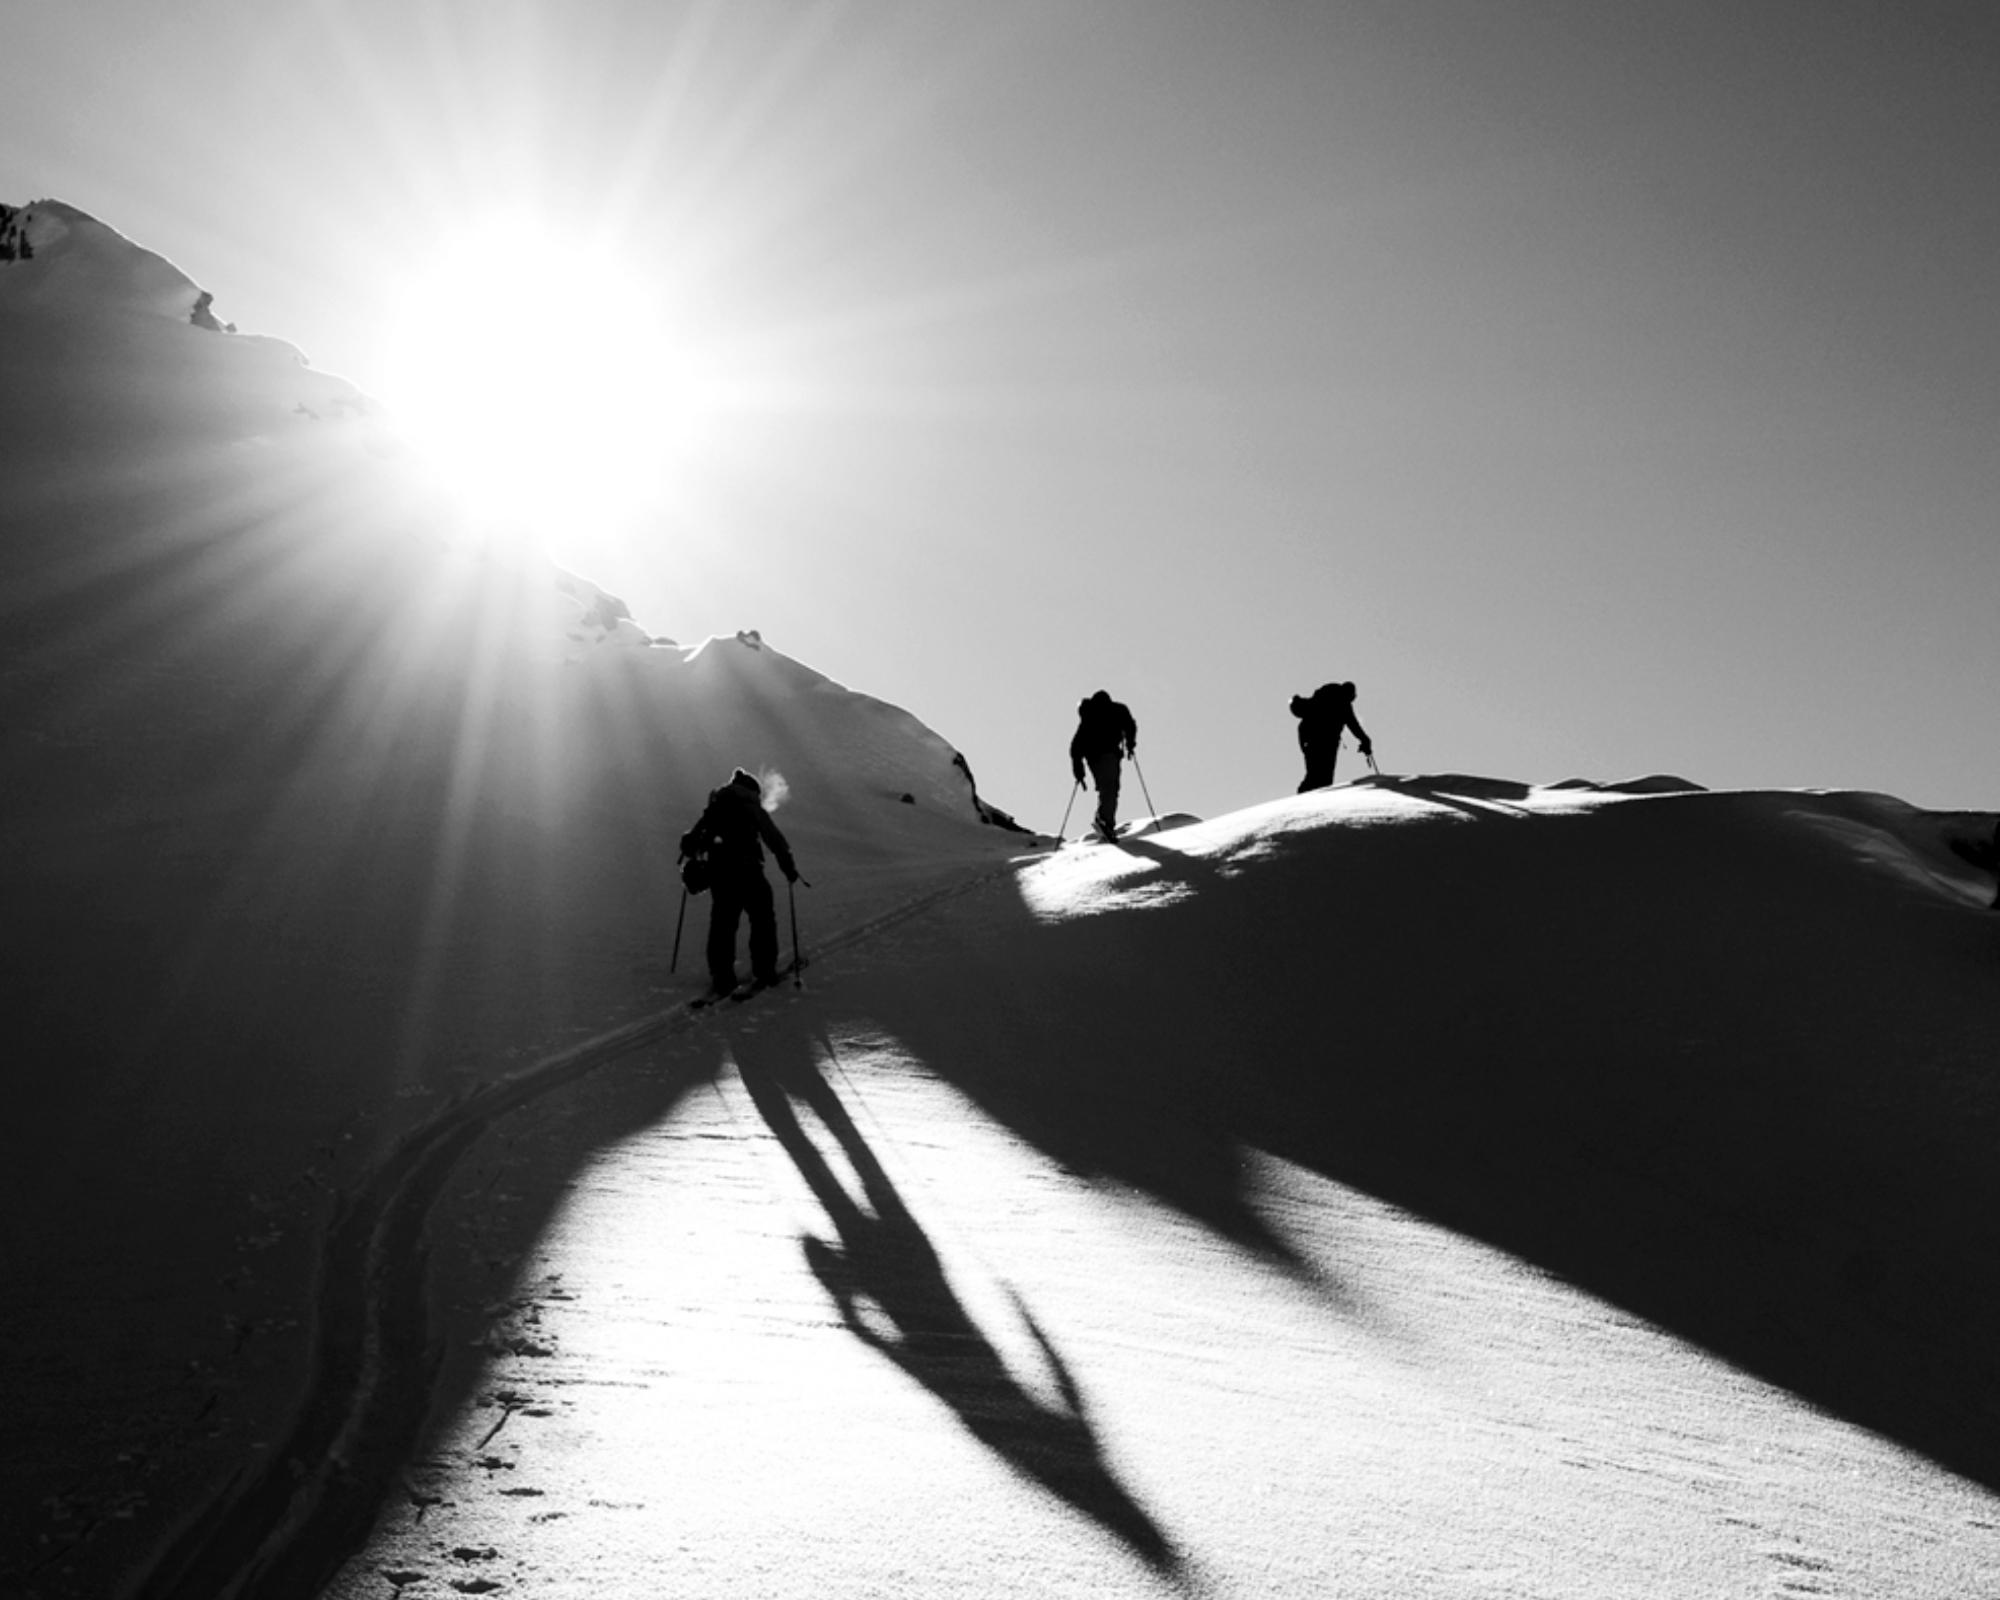 Whistler Backcountry Camp Ski Touring Powder 1